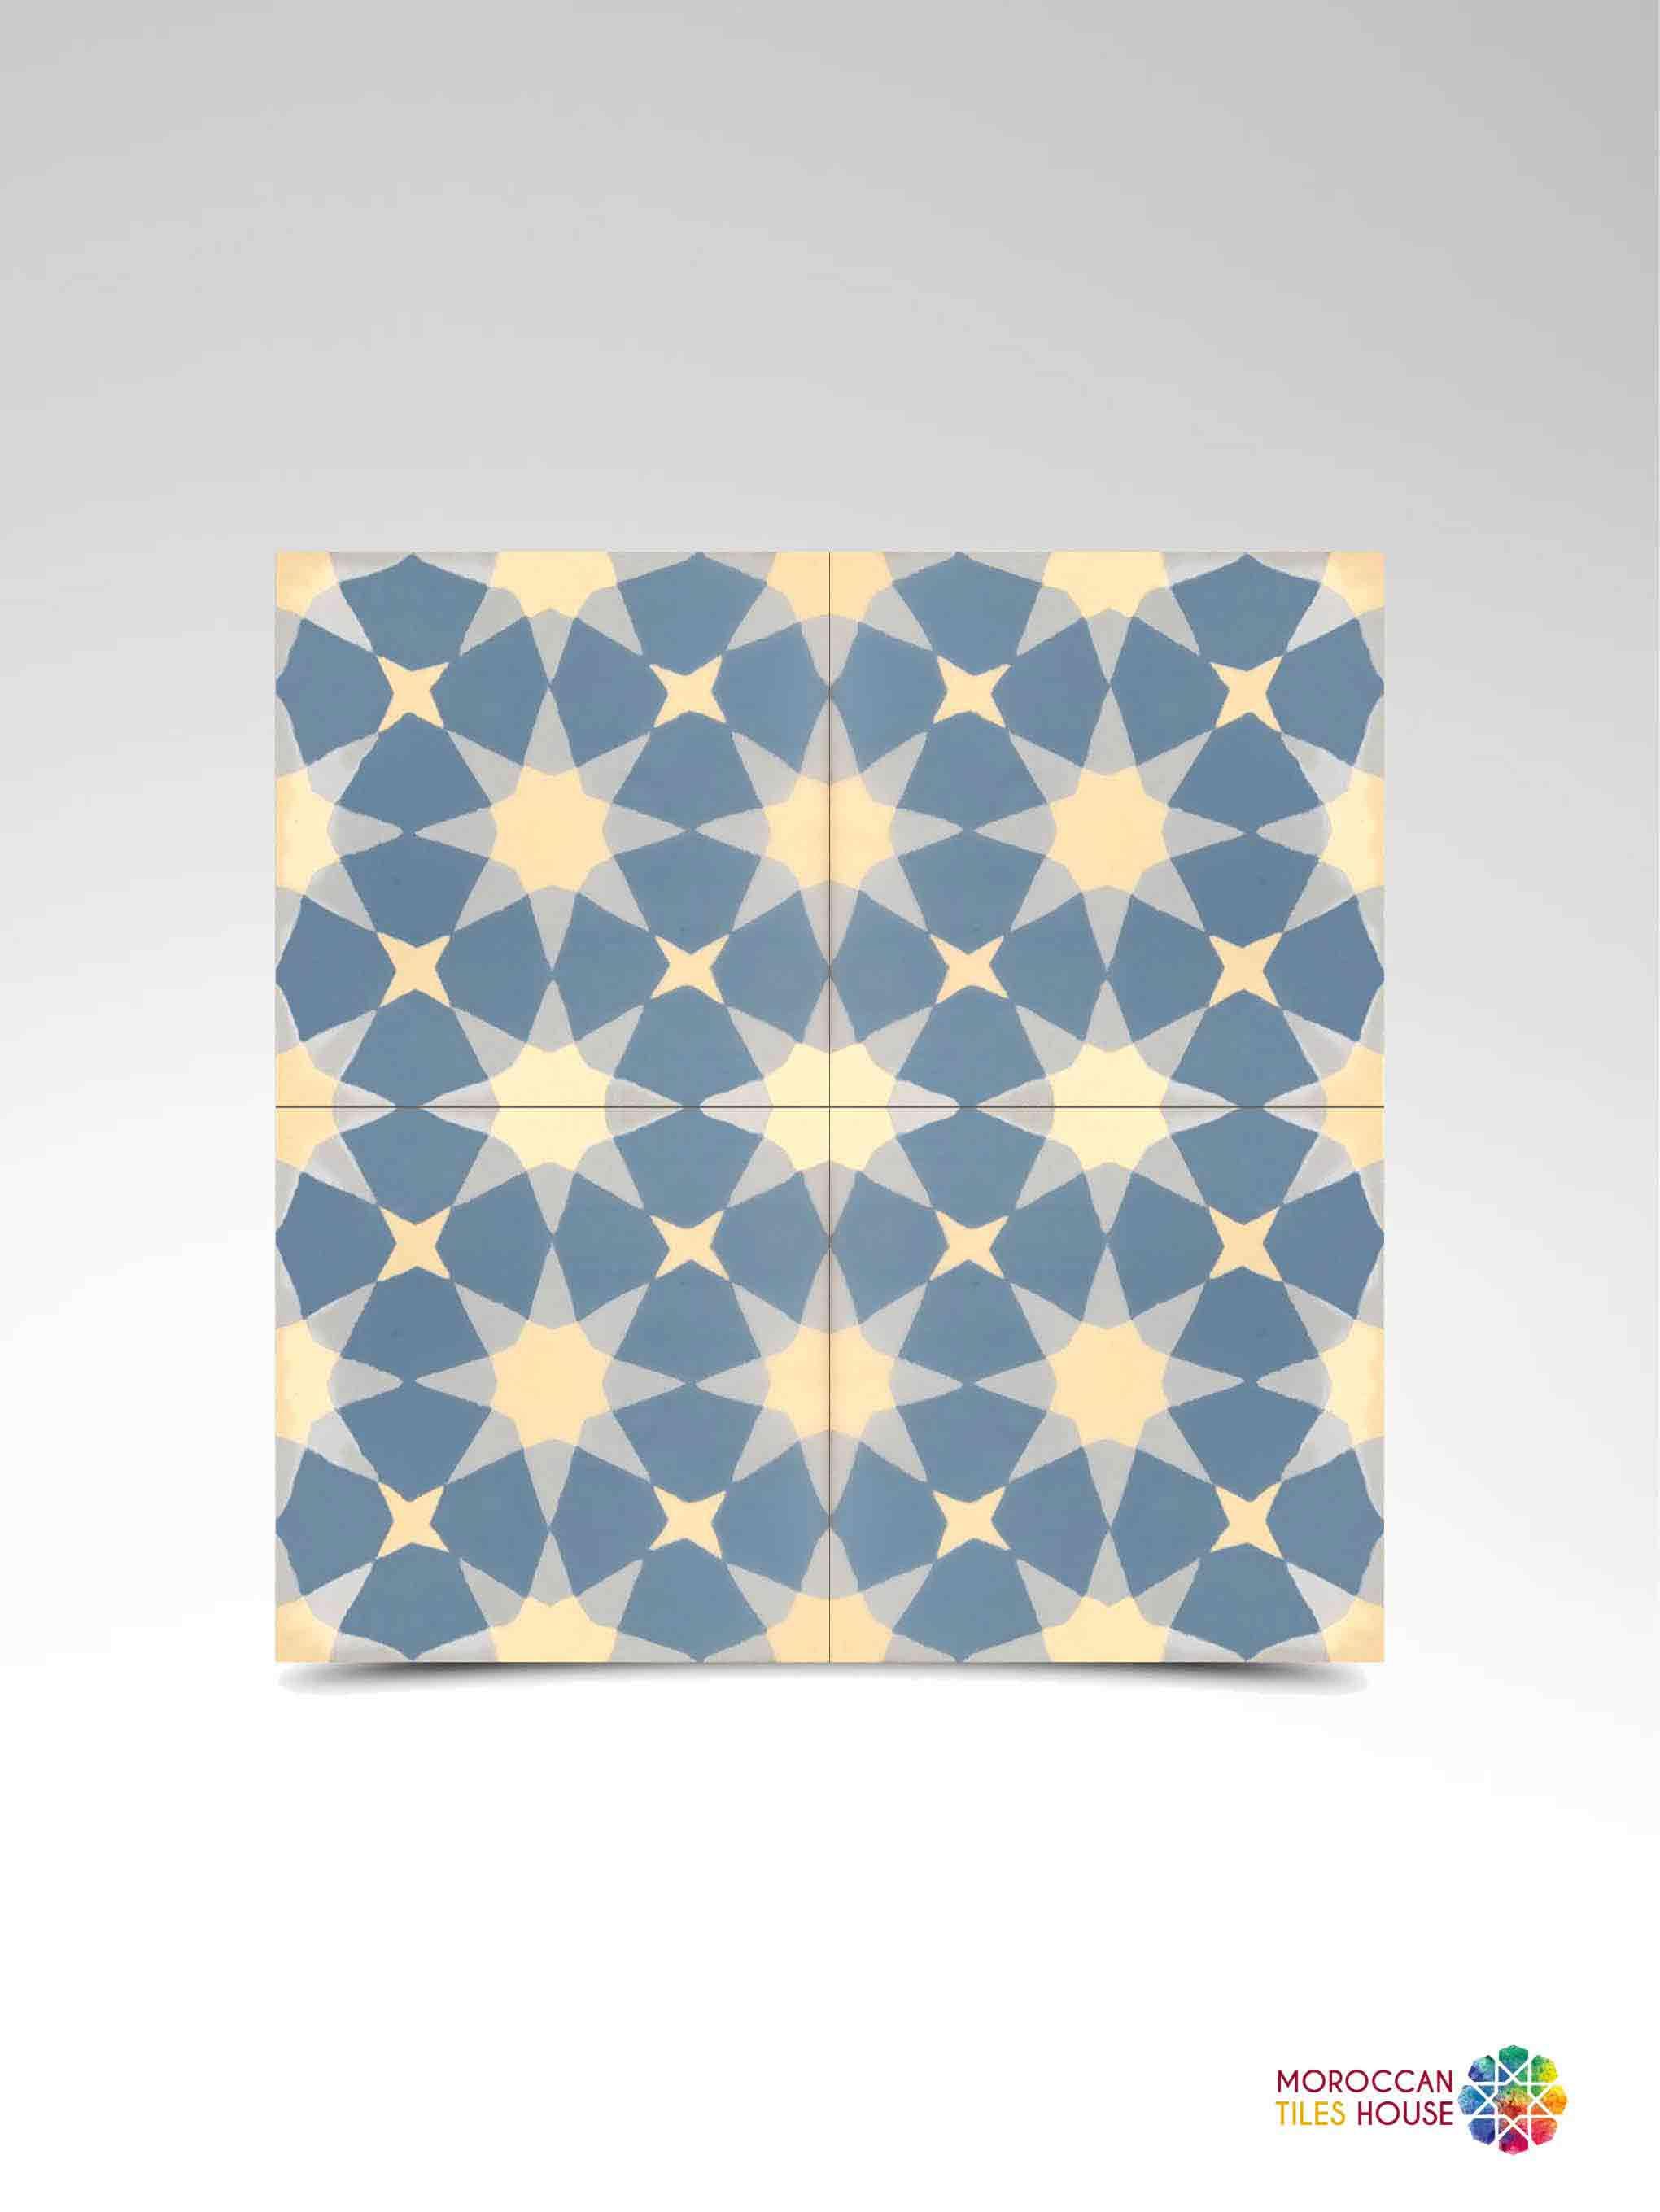 CI-1300718 - Moroccan Tiles House